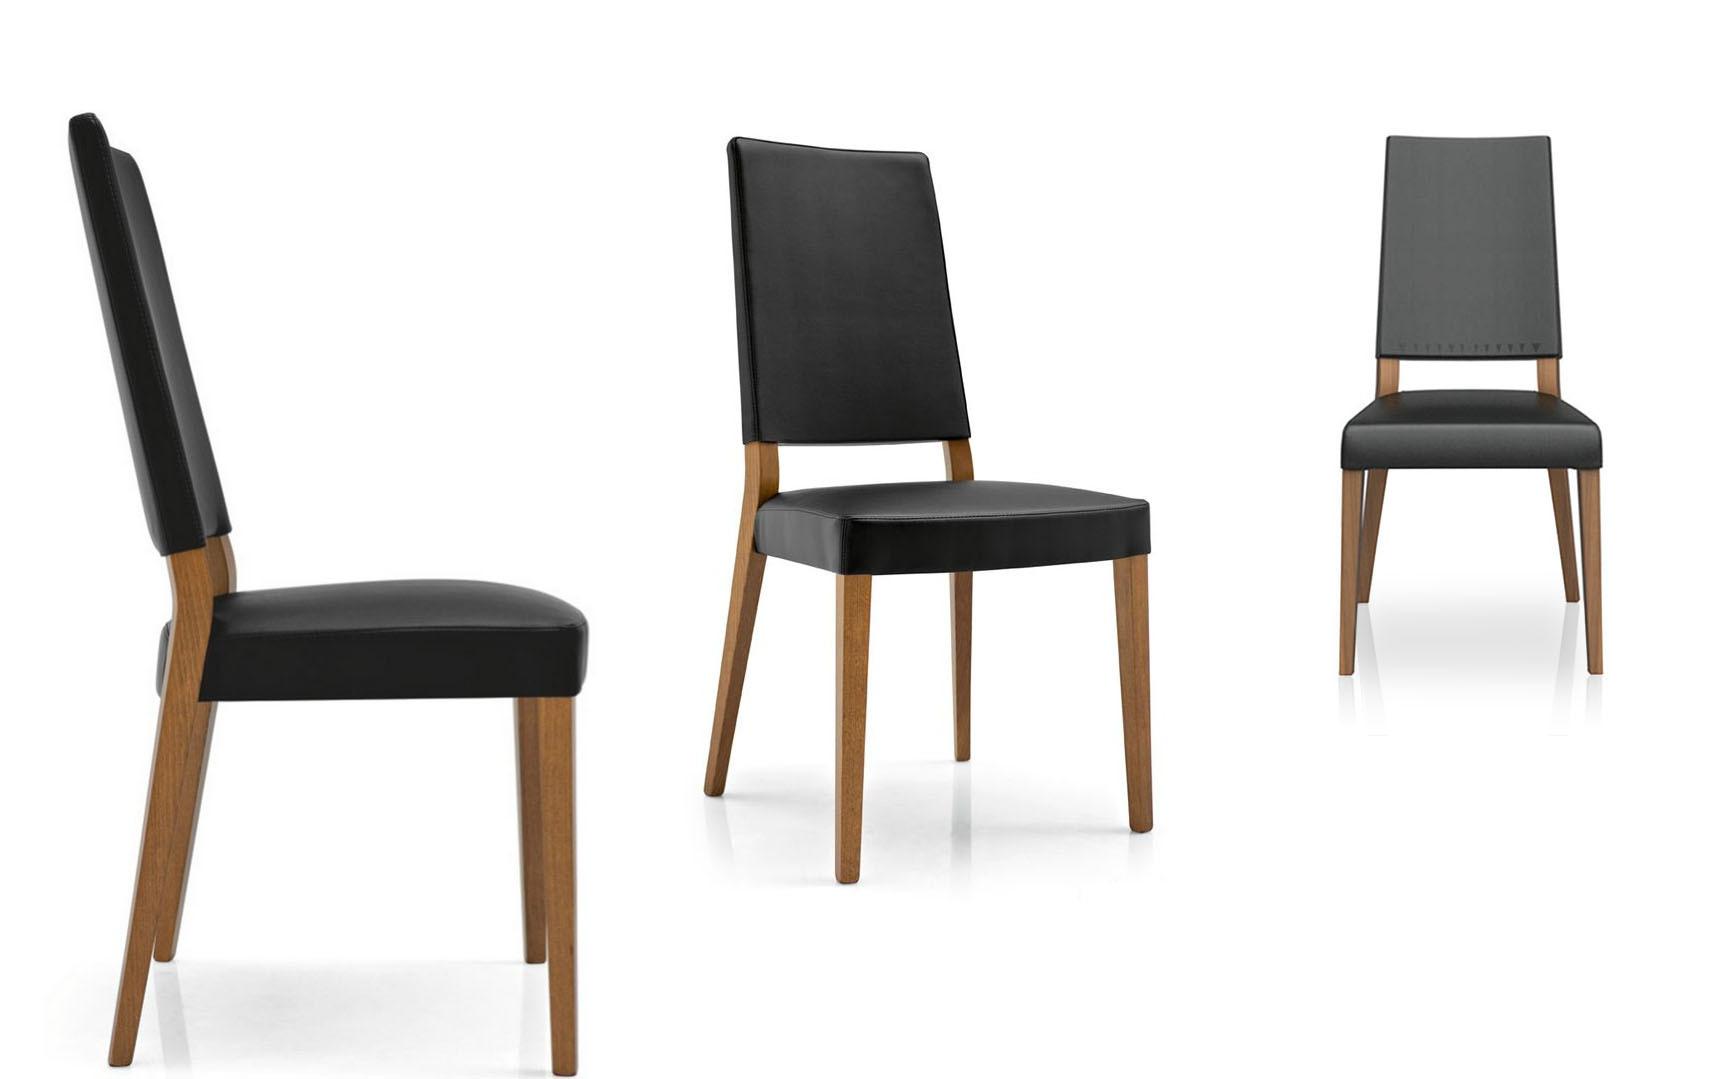 connubia calligaris sandy cb 1260 sk chair. Black Bedroom Furniture Sets. Home Design Ideas